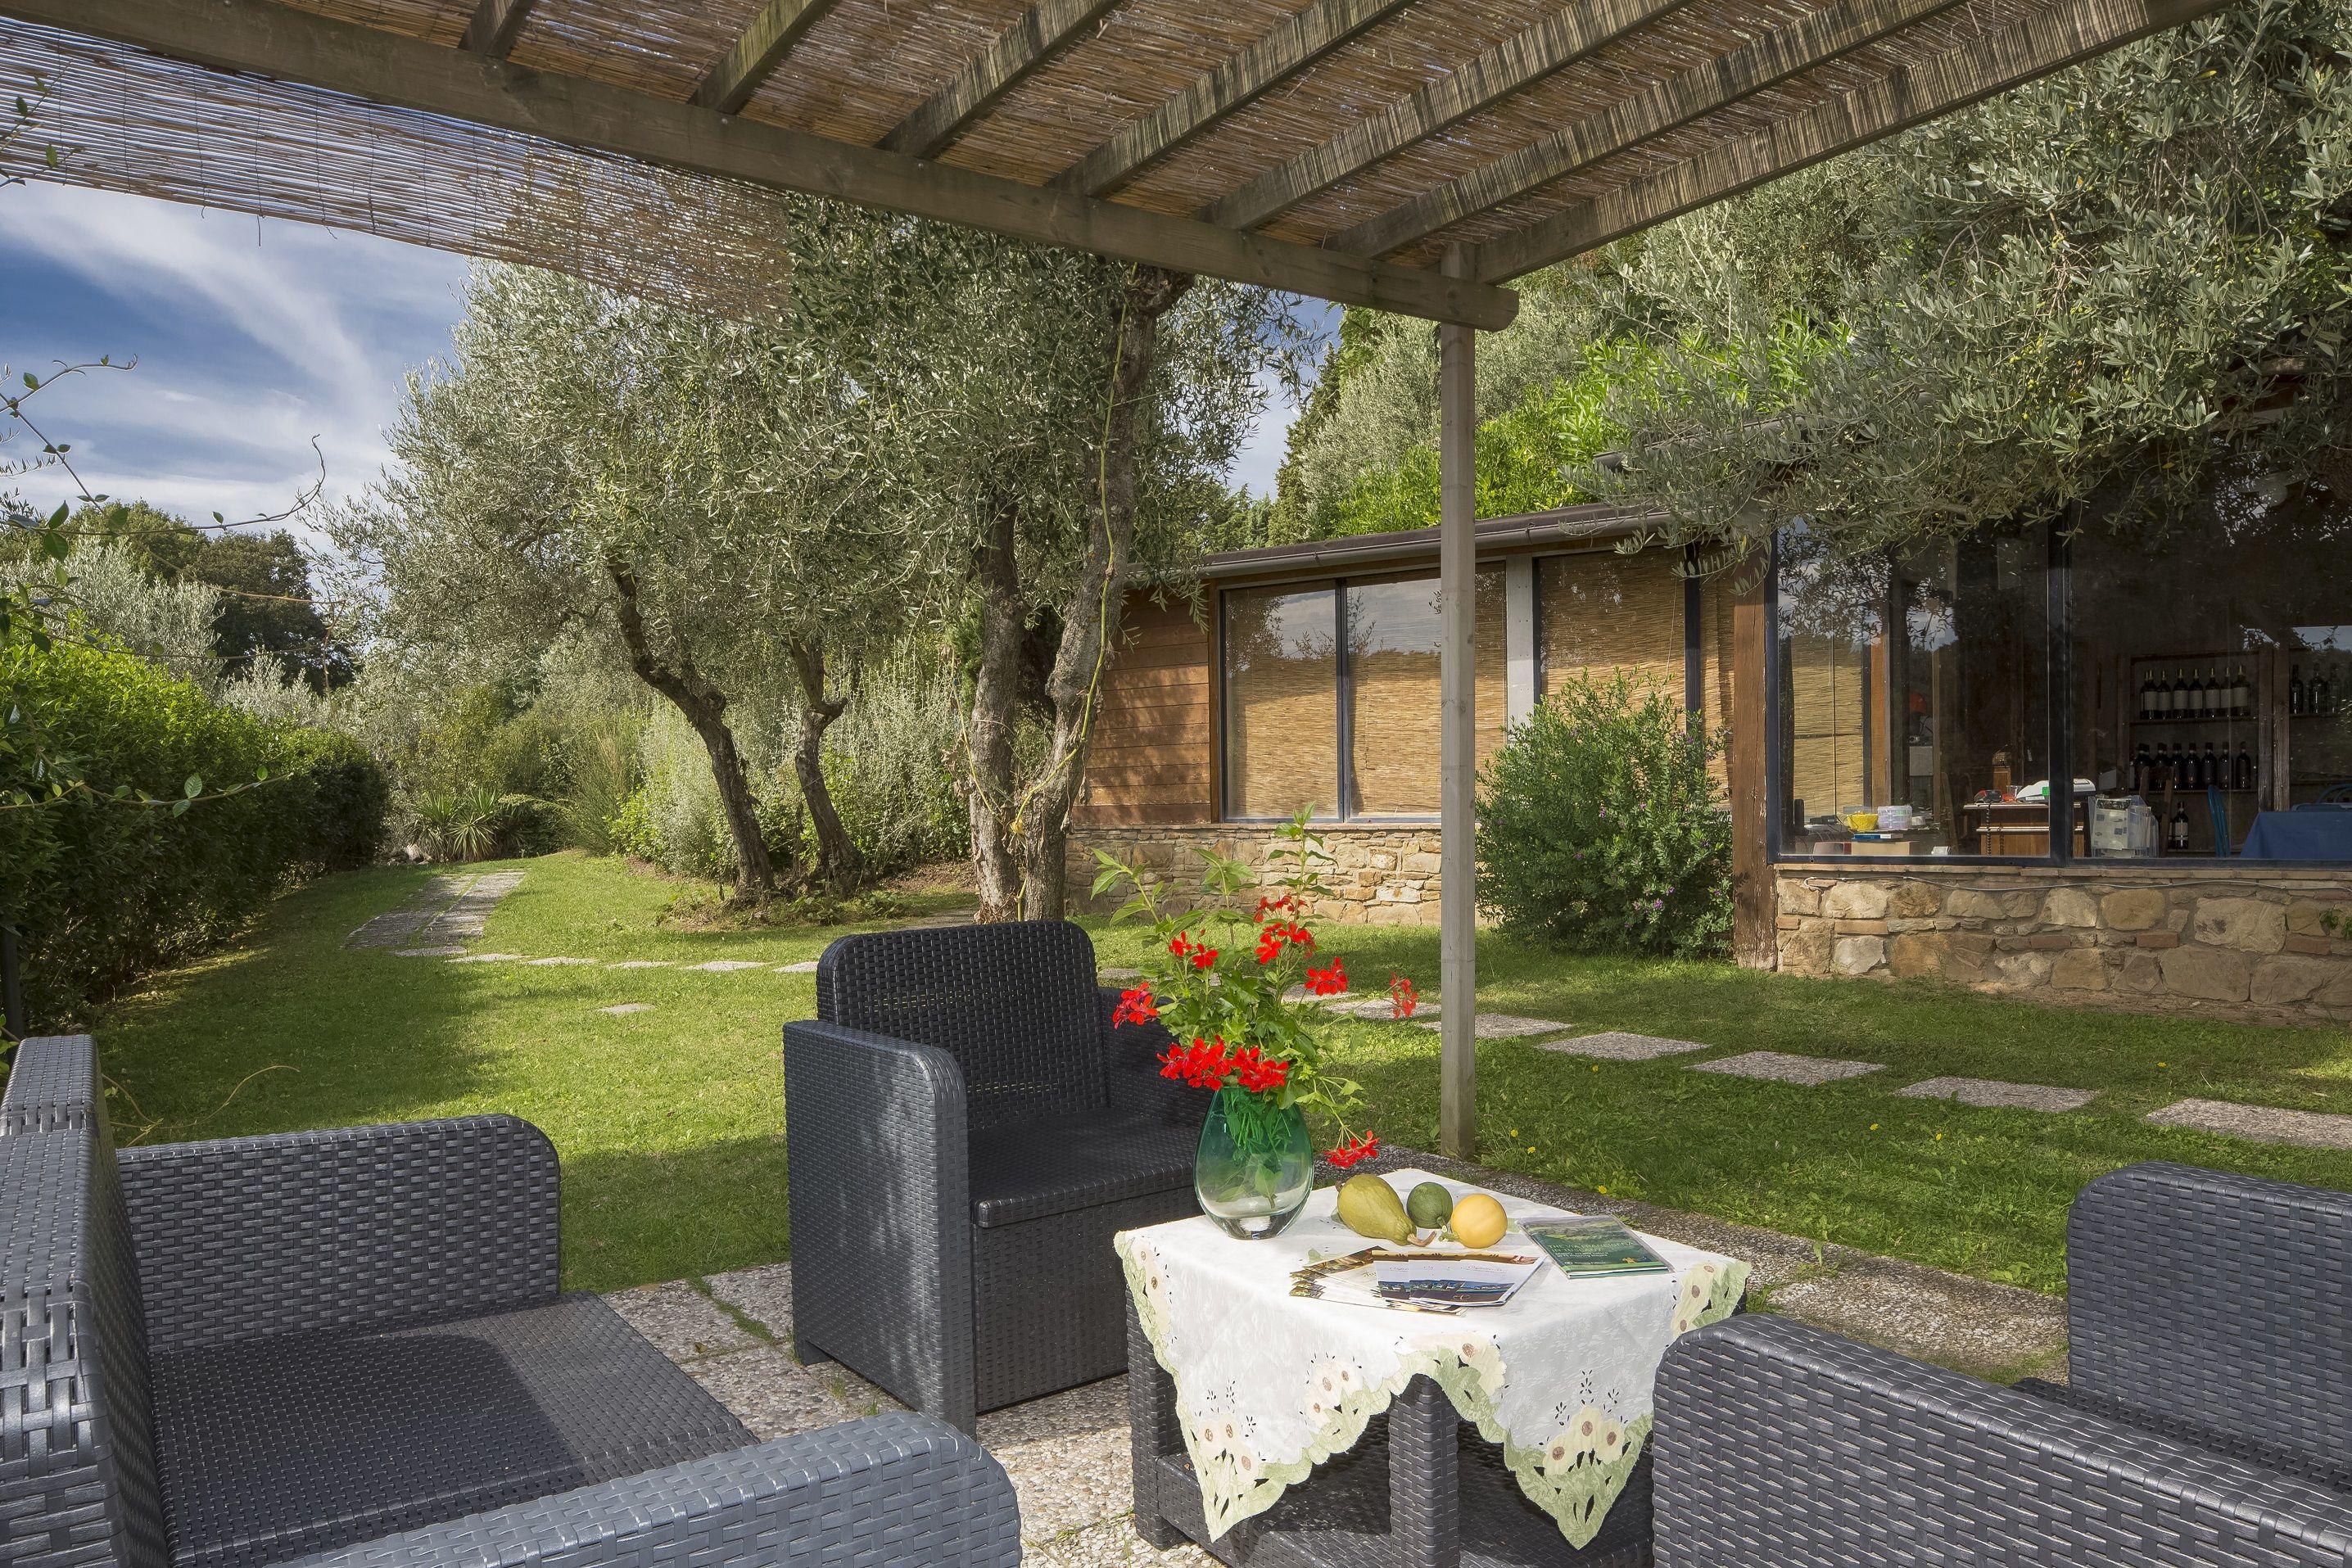 Apartment Agriturismo Il Sapito - Rossini Holiday Home photo 16174110